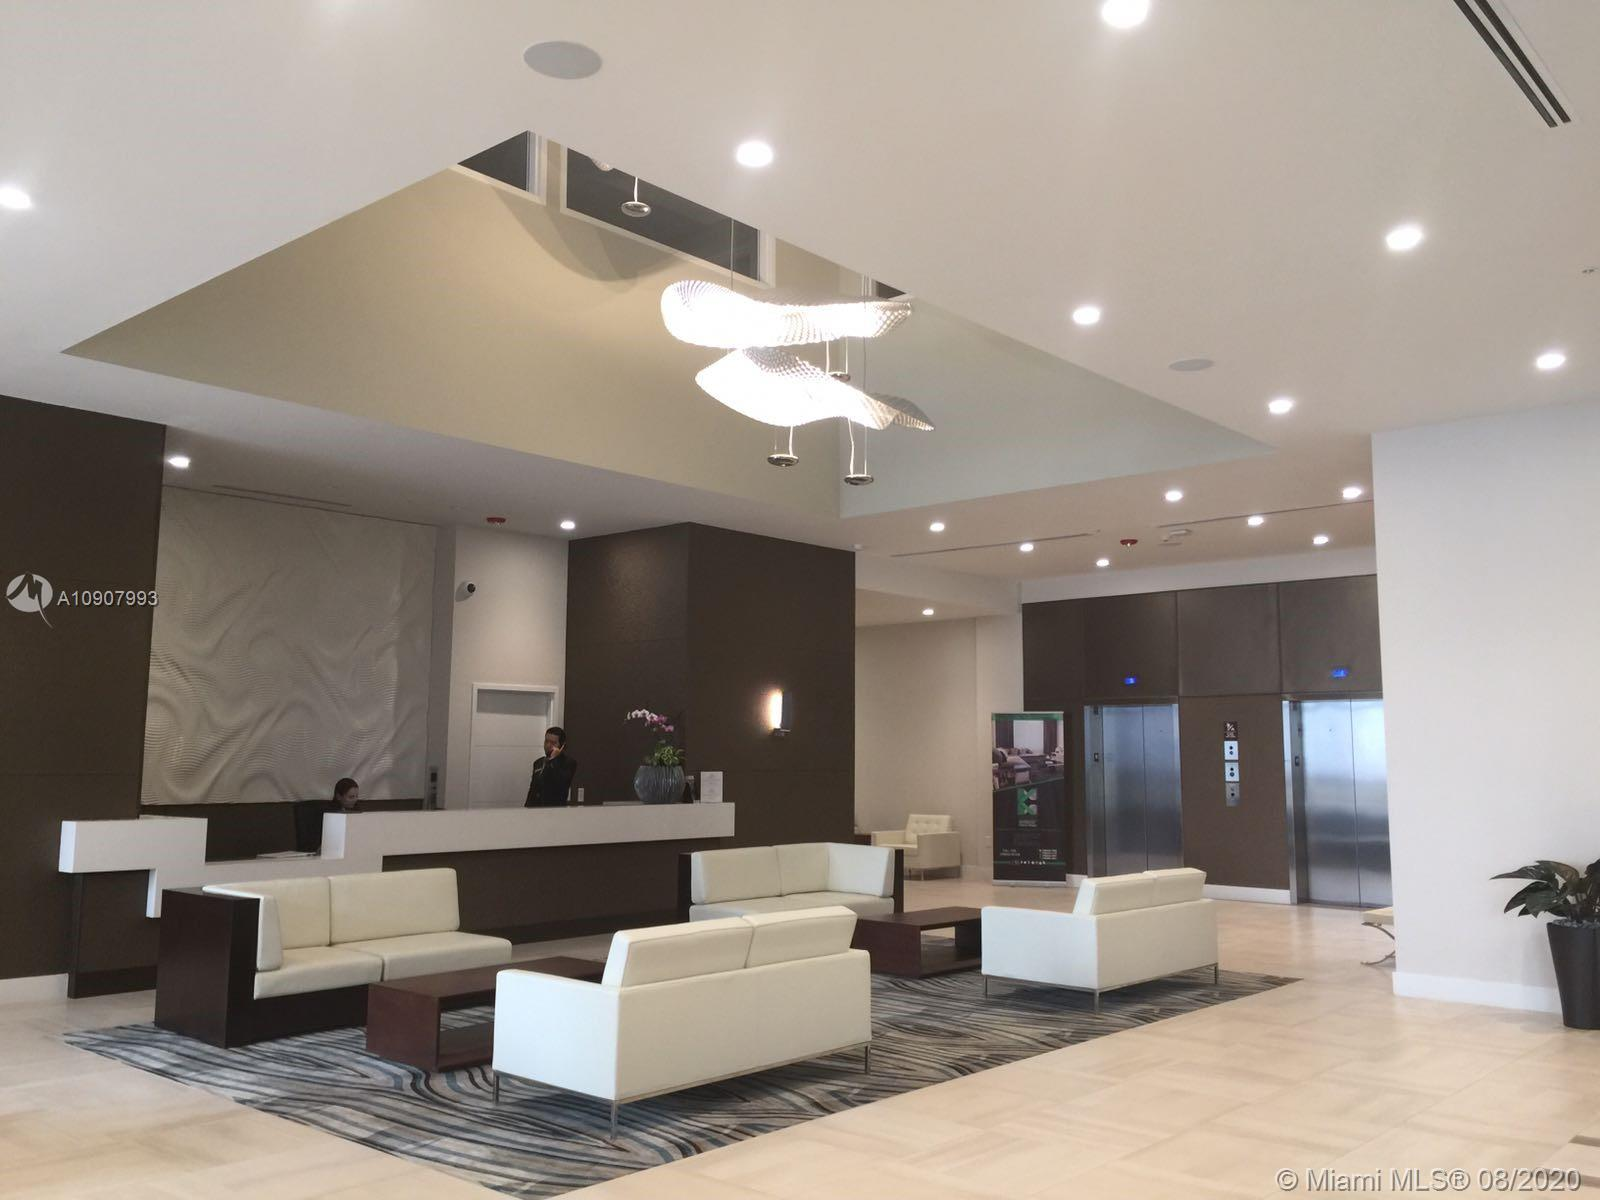 Midtown Doral - Building 3 #419 - 7825 NW 107 AVE #419, Doral, FL 33178